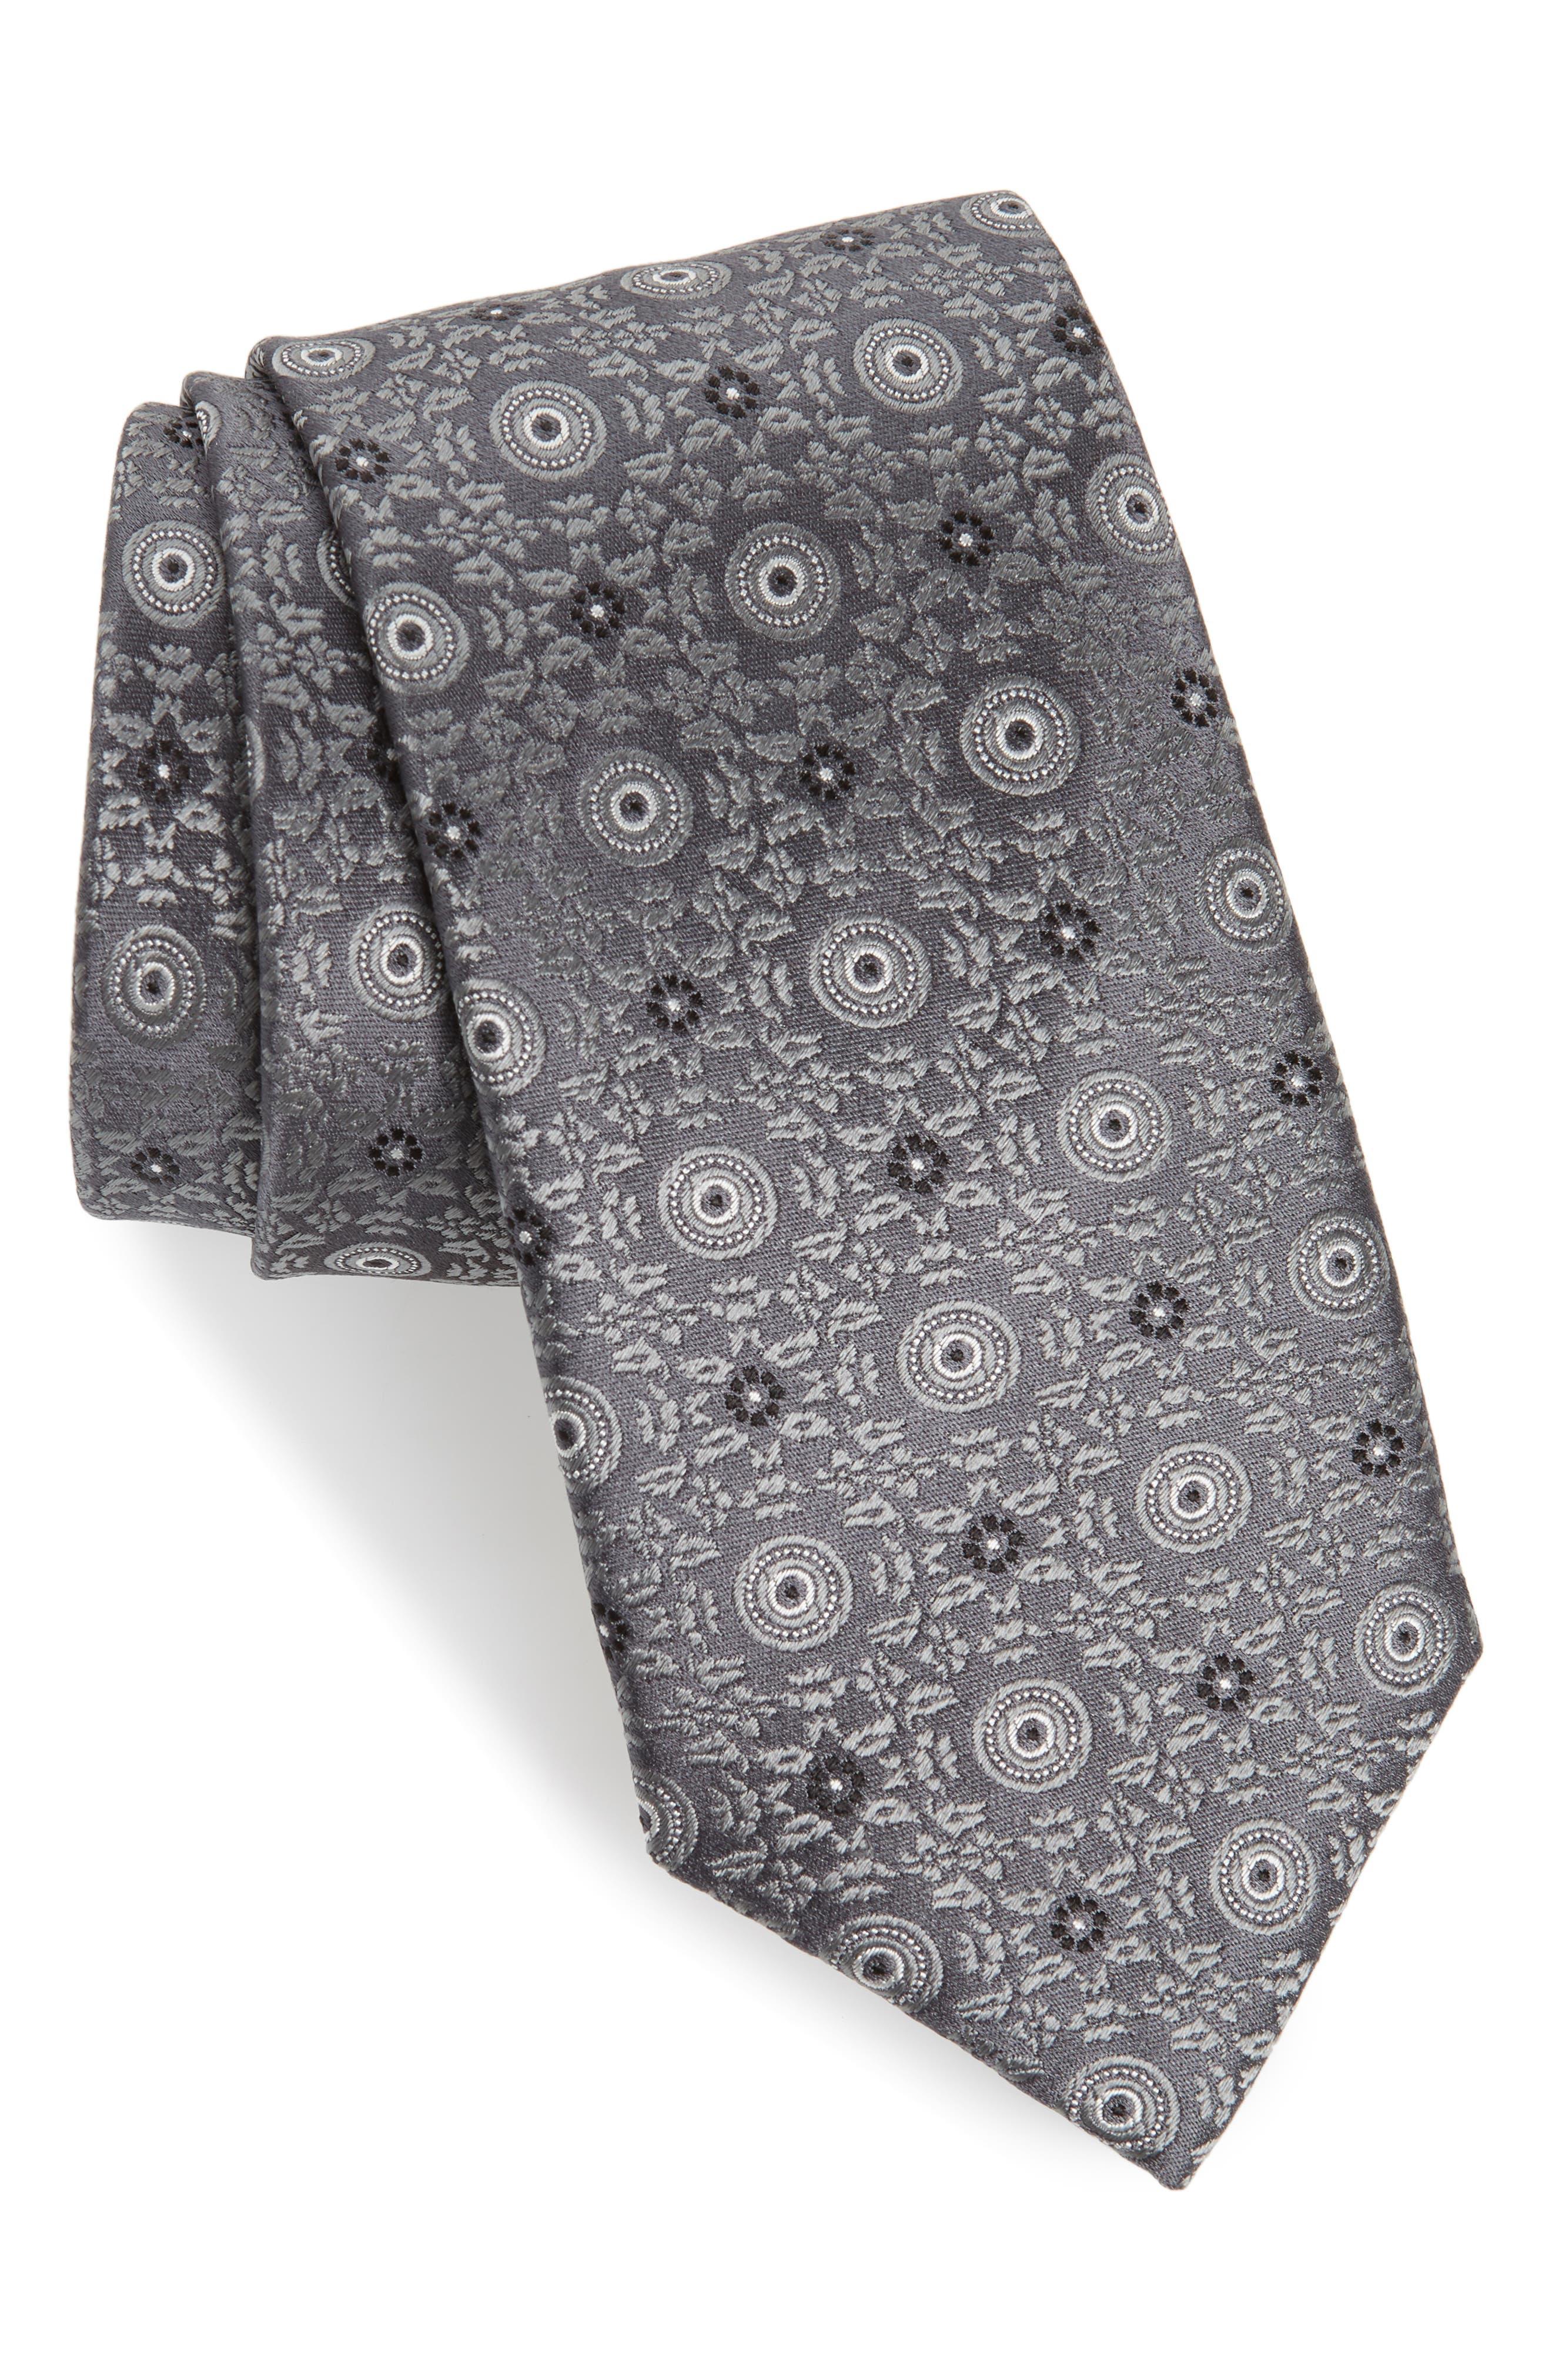 CANALI, Medallion Silk Tie, Main thumbnail 1, color, GREY